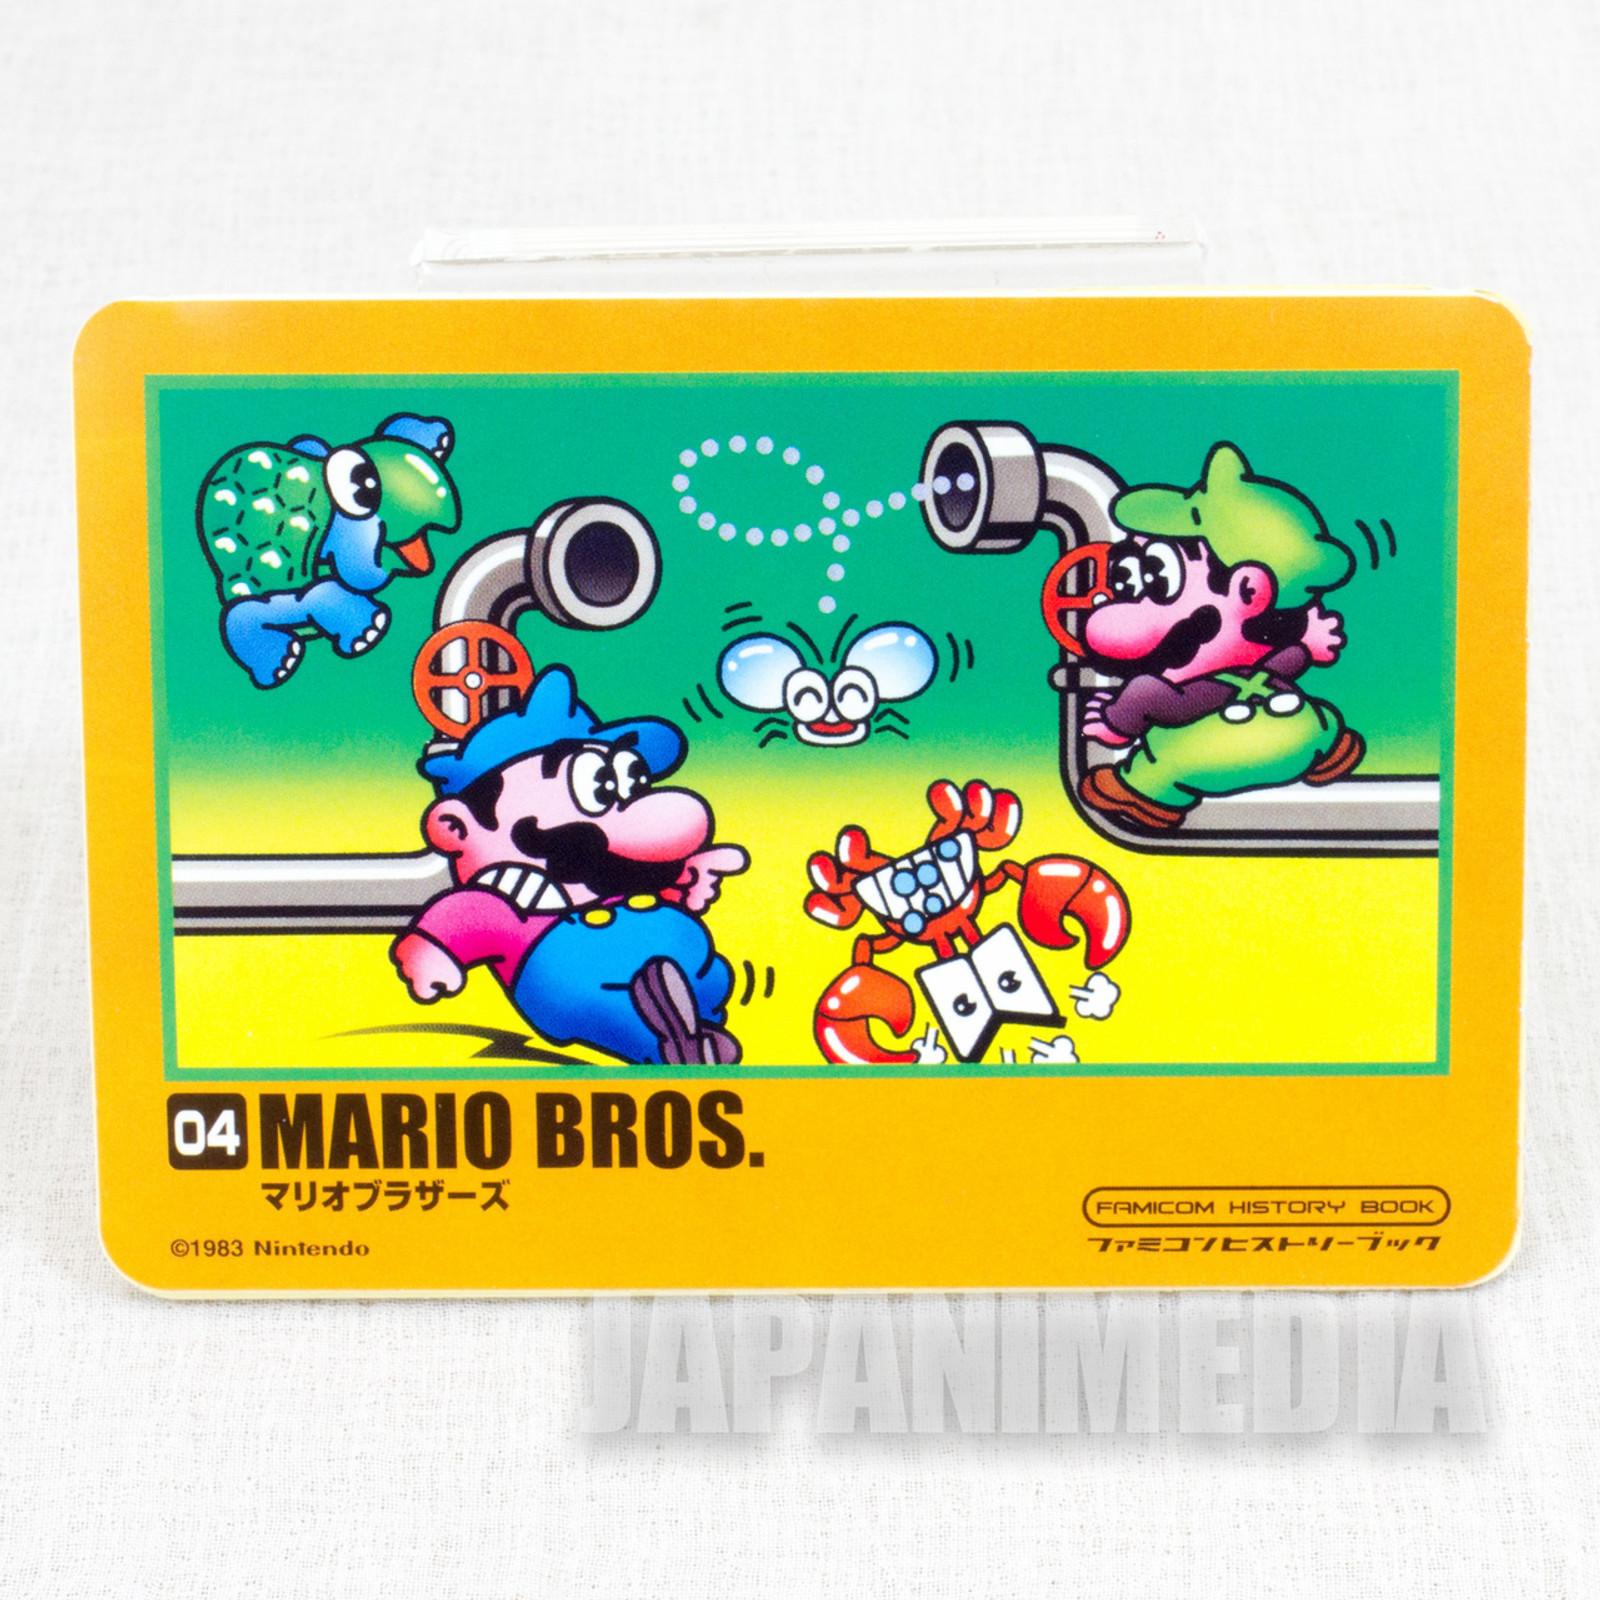 RARE Mario Bros. & Dr. Mario Sticker Famicon History Book JAPAN GAME NES